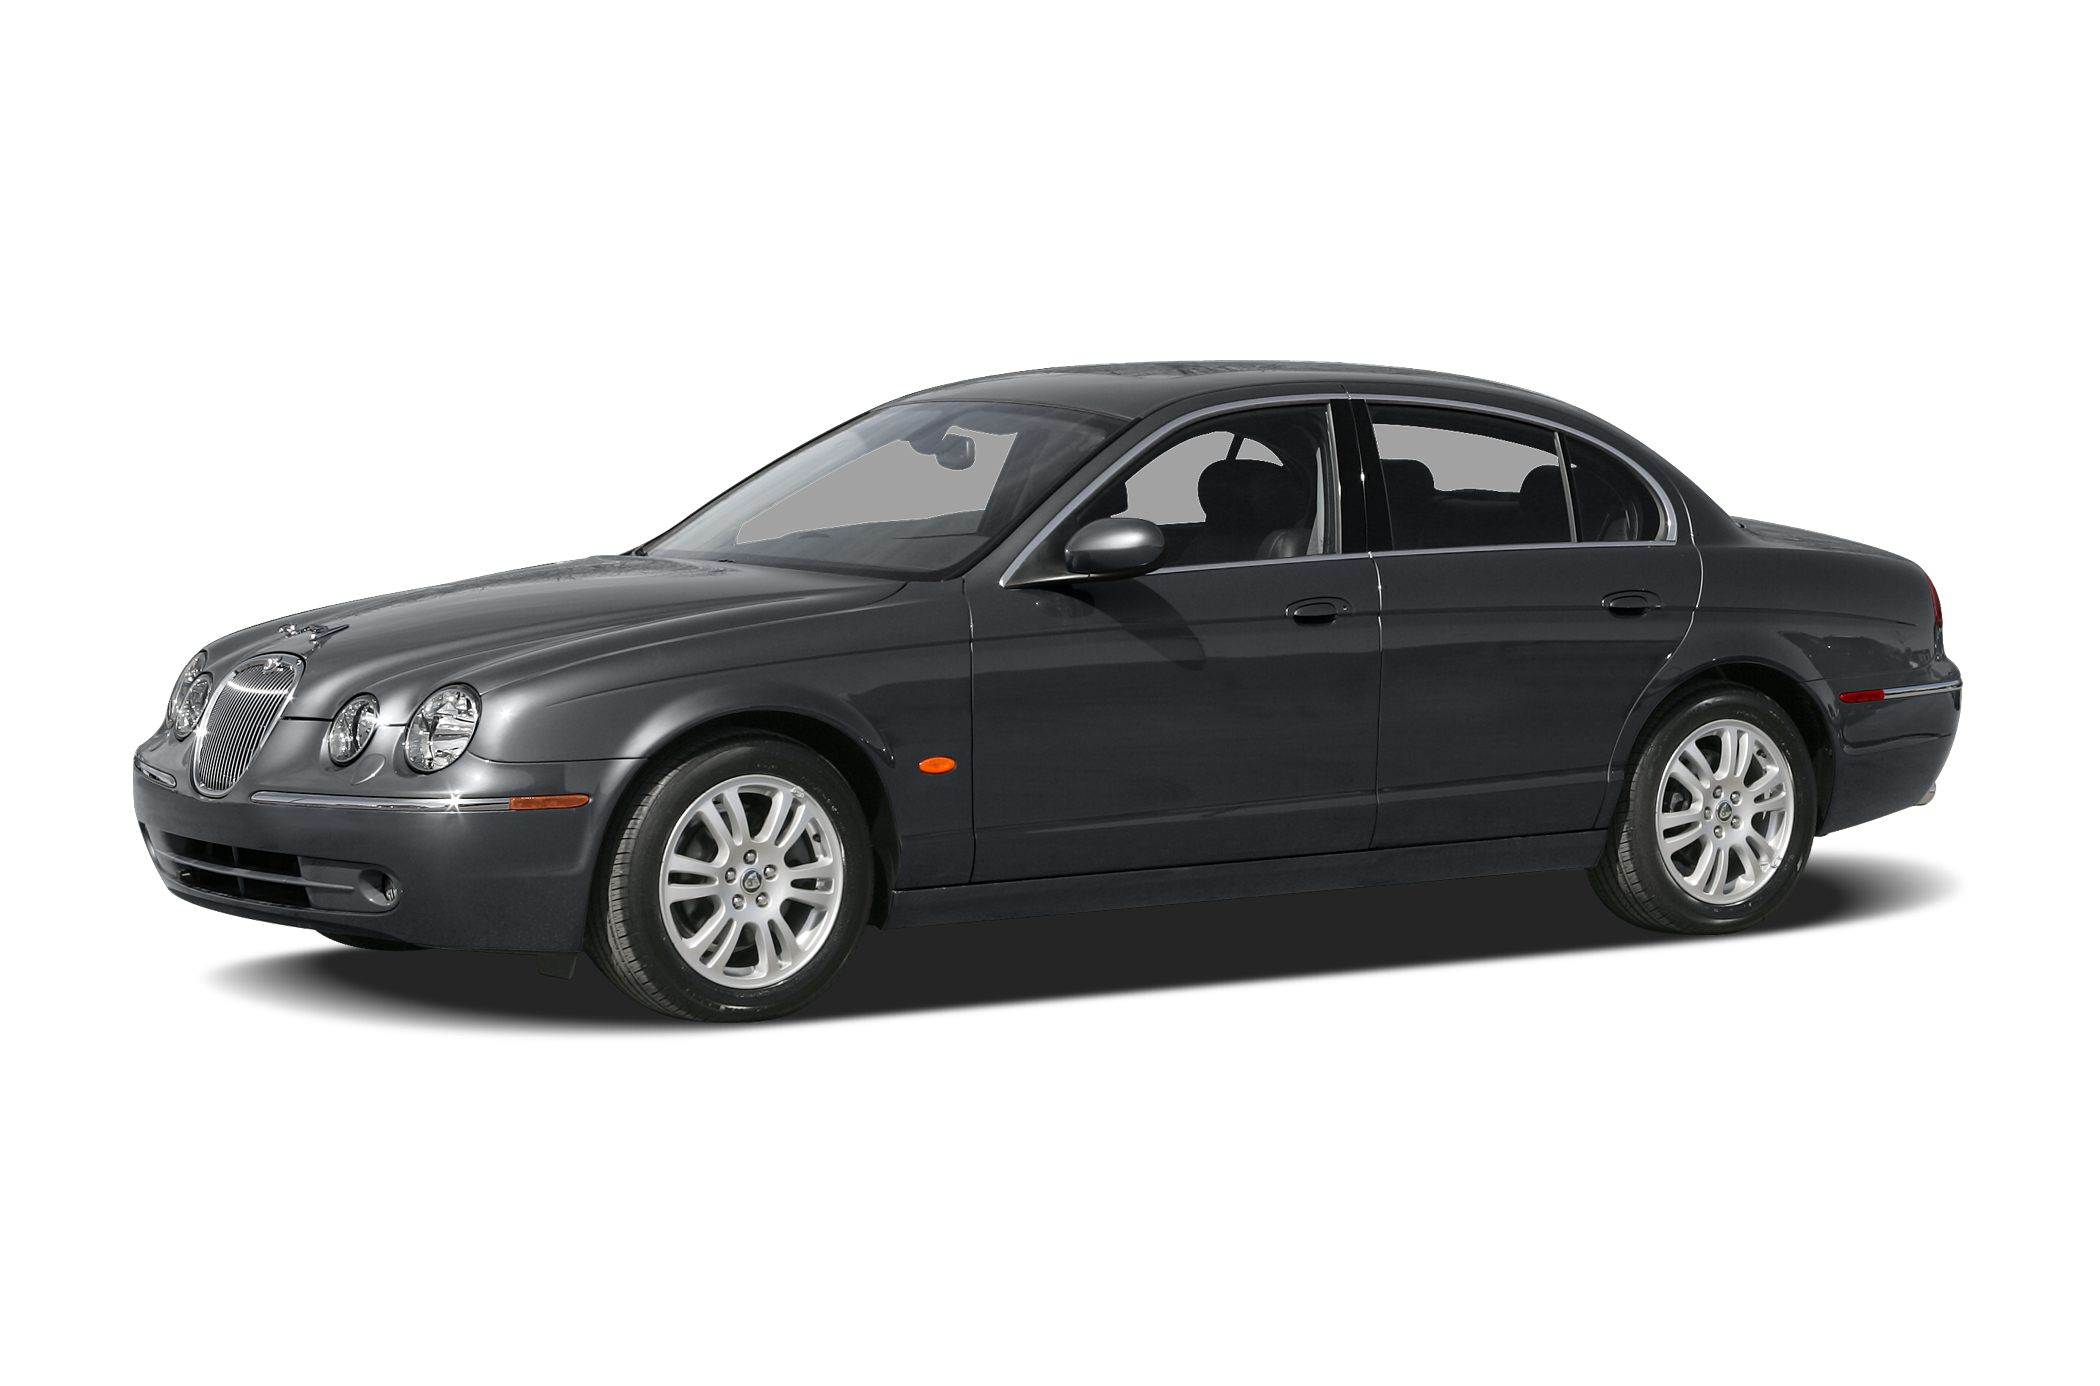 2008 Jaguar S-TYPE 30 Miles 68341Stock N88446 VIN SAJWA01A68FN88446